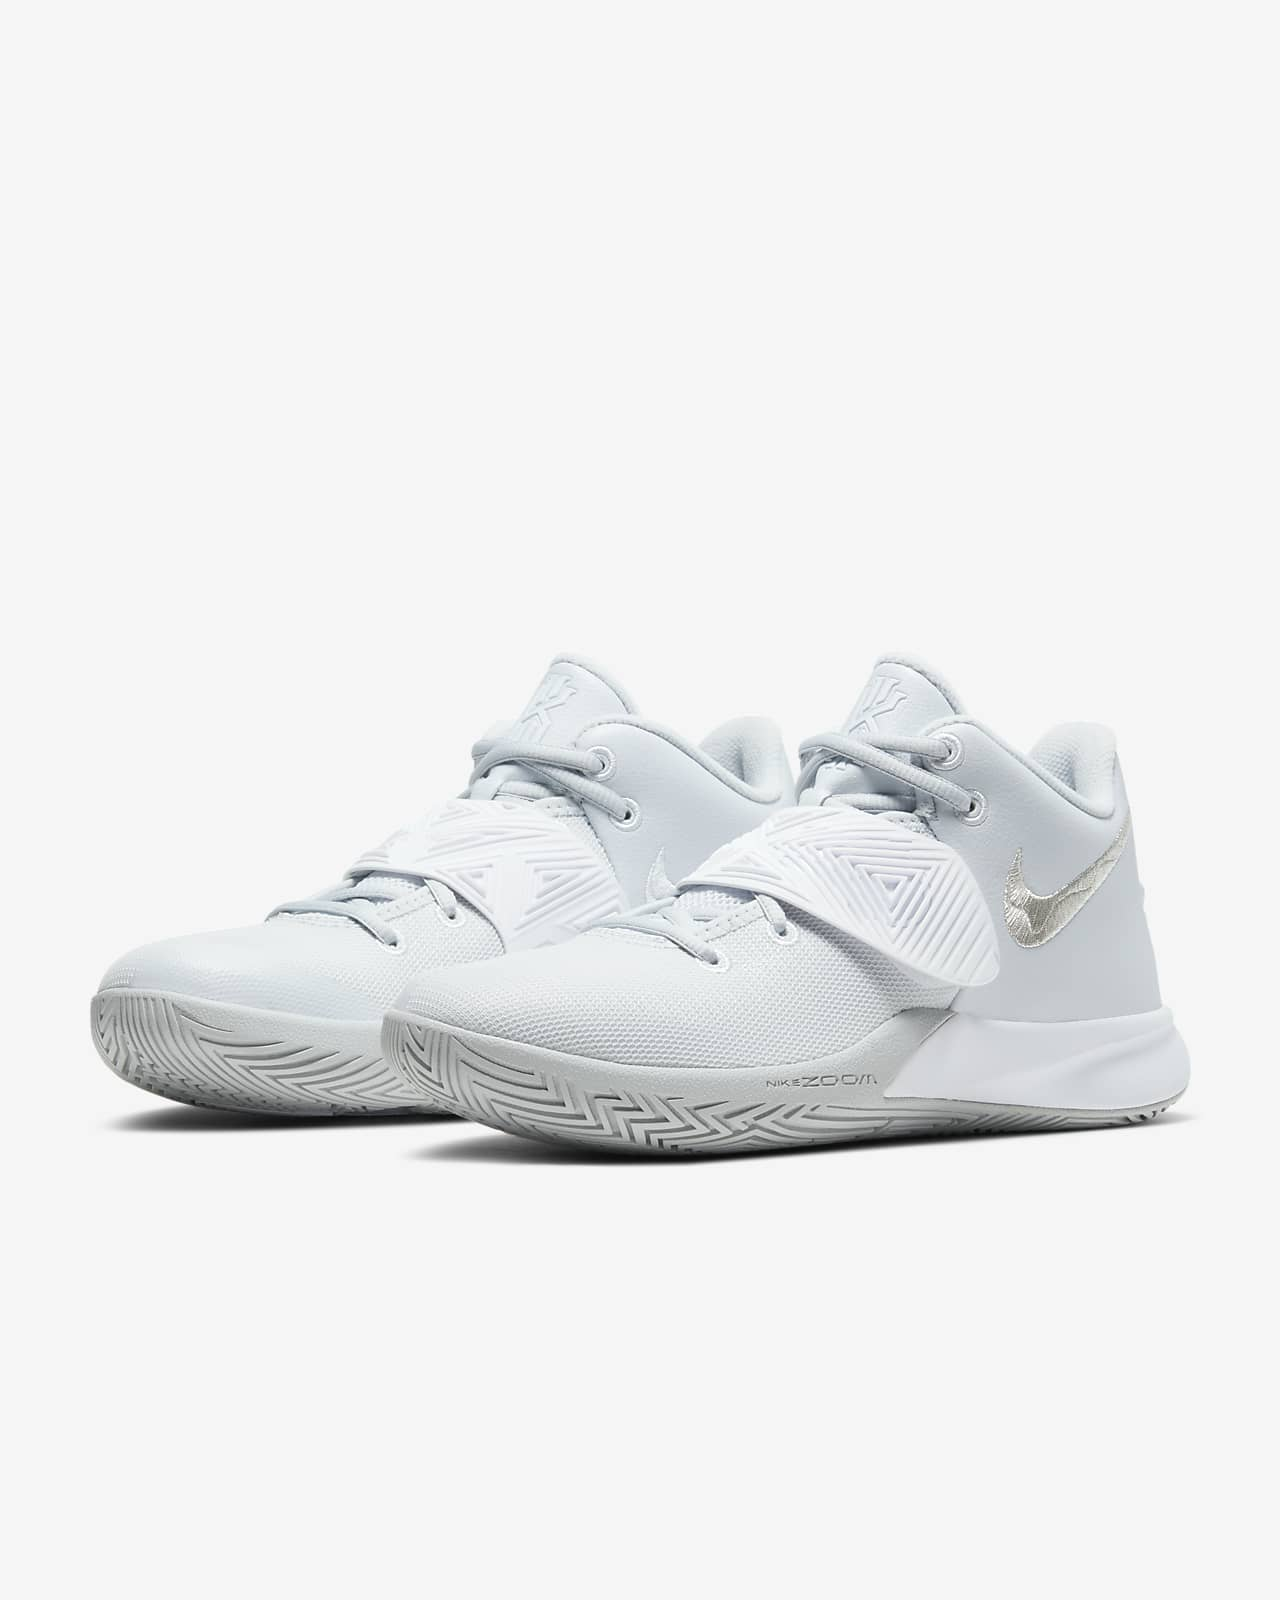 Kyrie Flytrap 3 Basketball Shoe. Nike.com